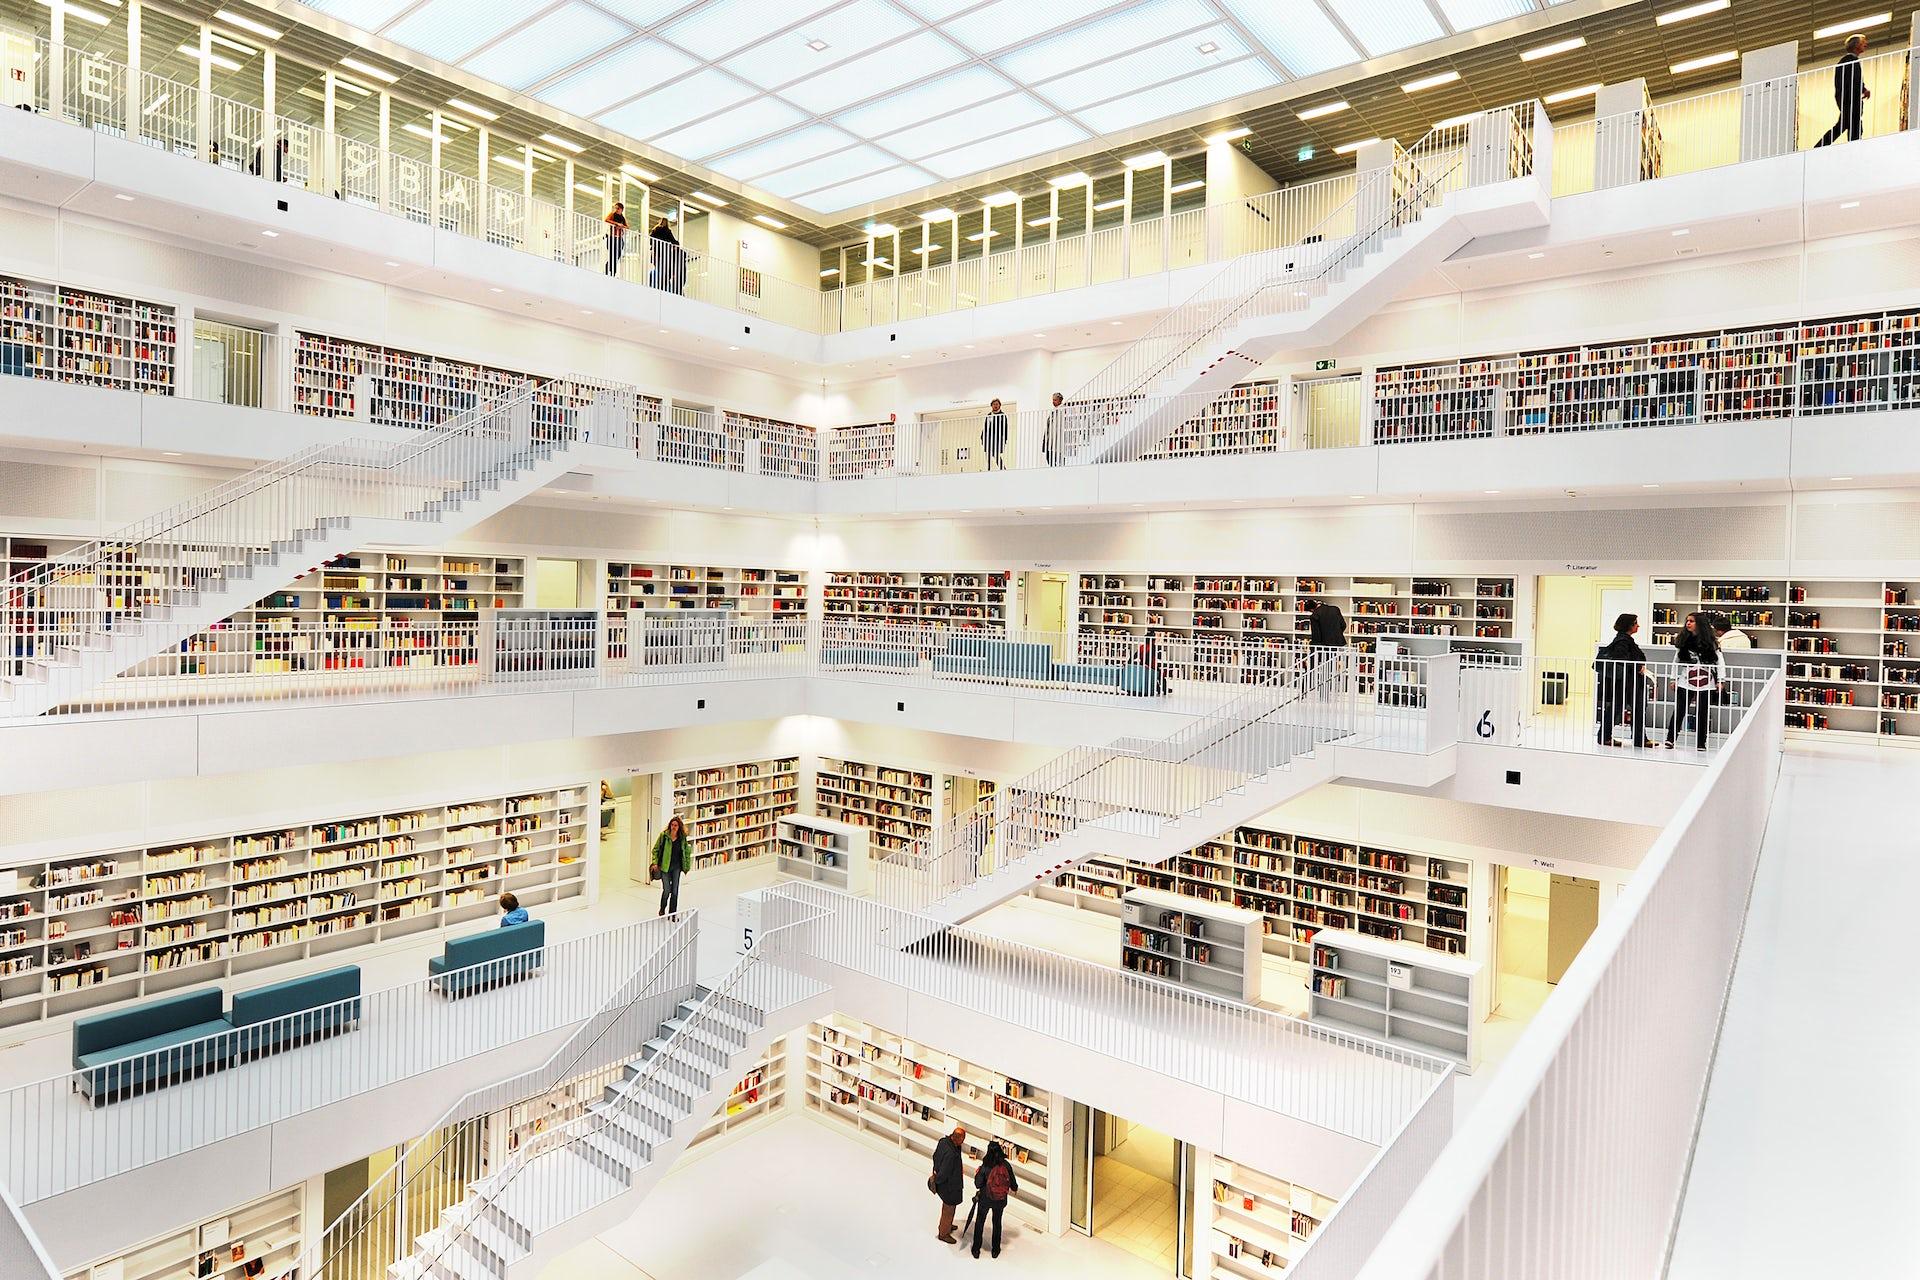 Libraries of future essay